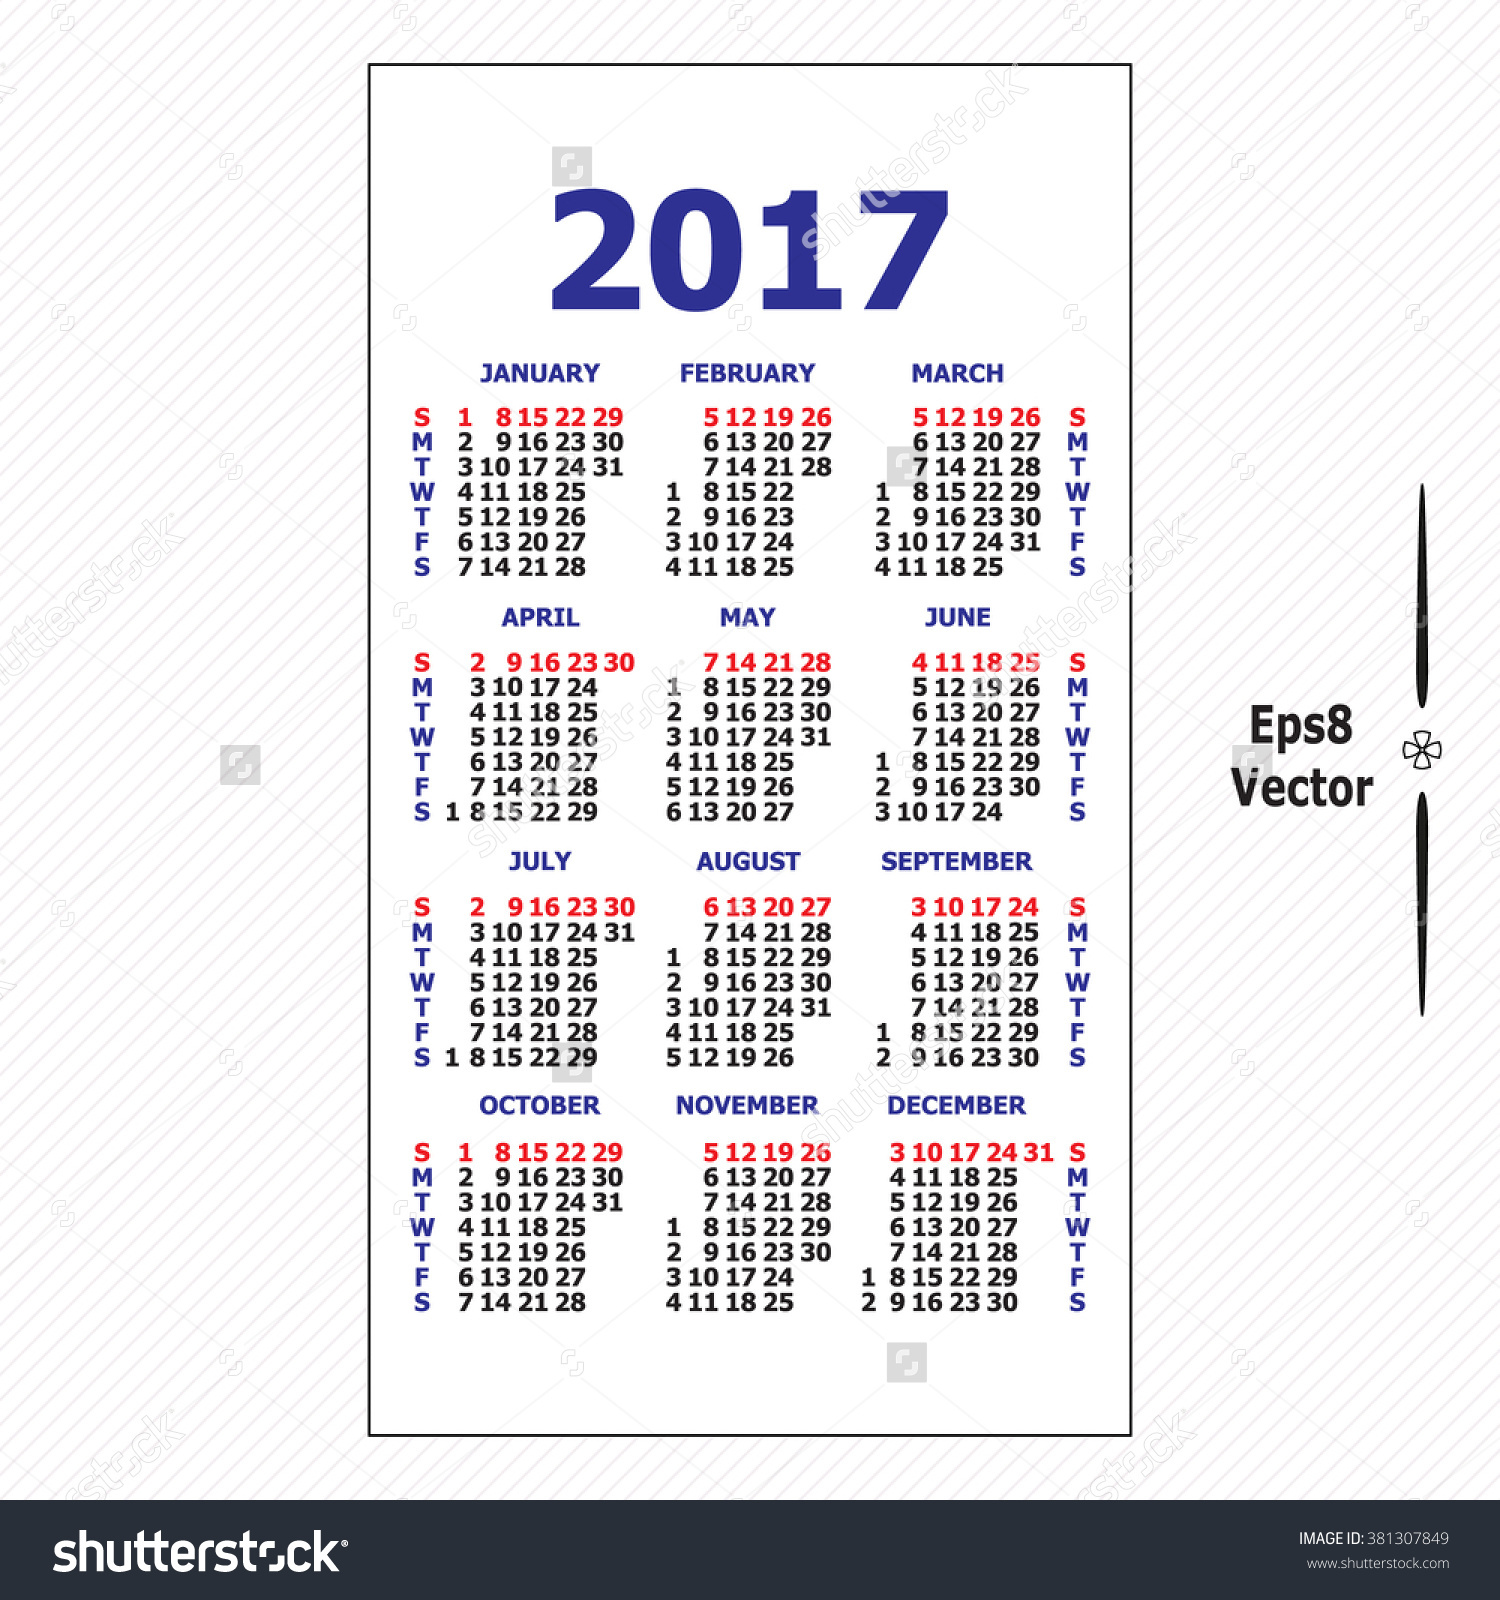 2017 Pocket Calendar Template Calendar Grid Stock Vector 381307849